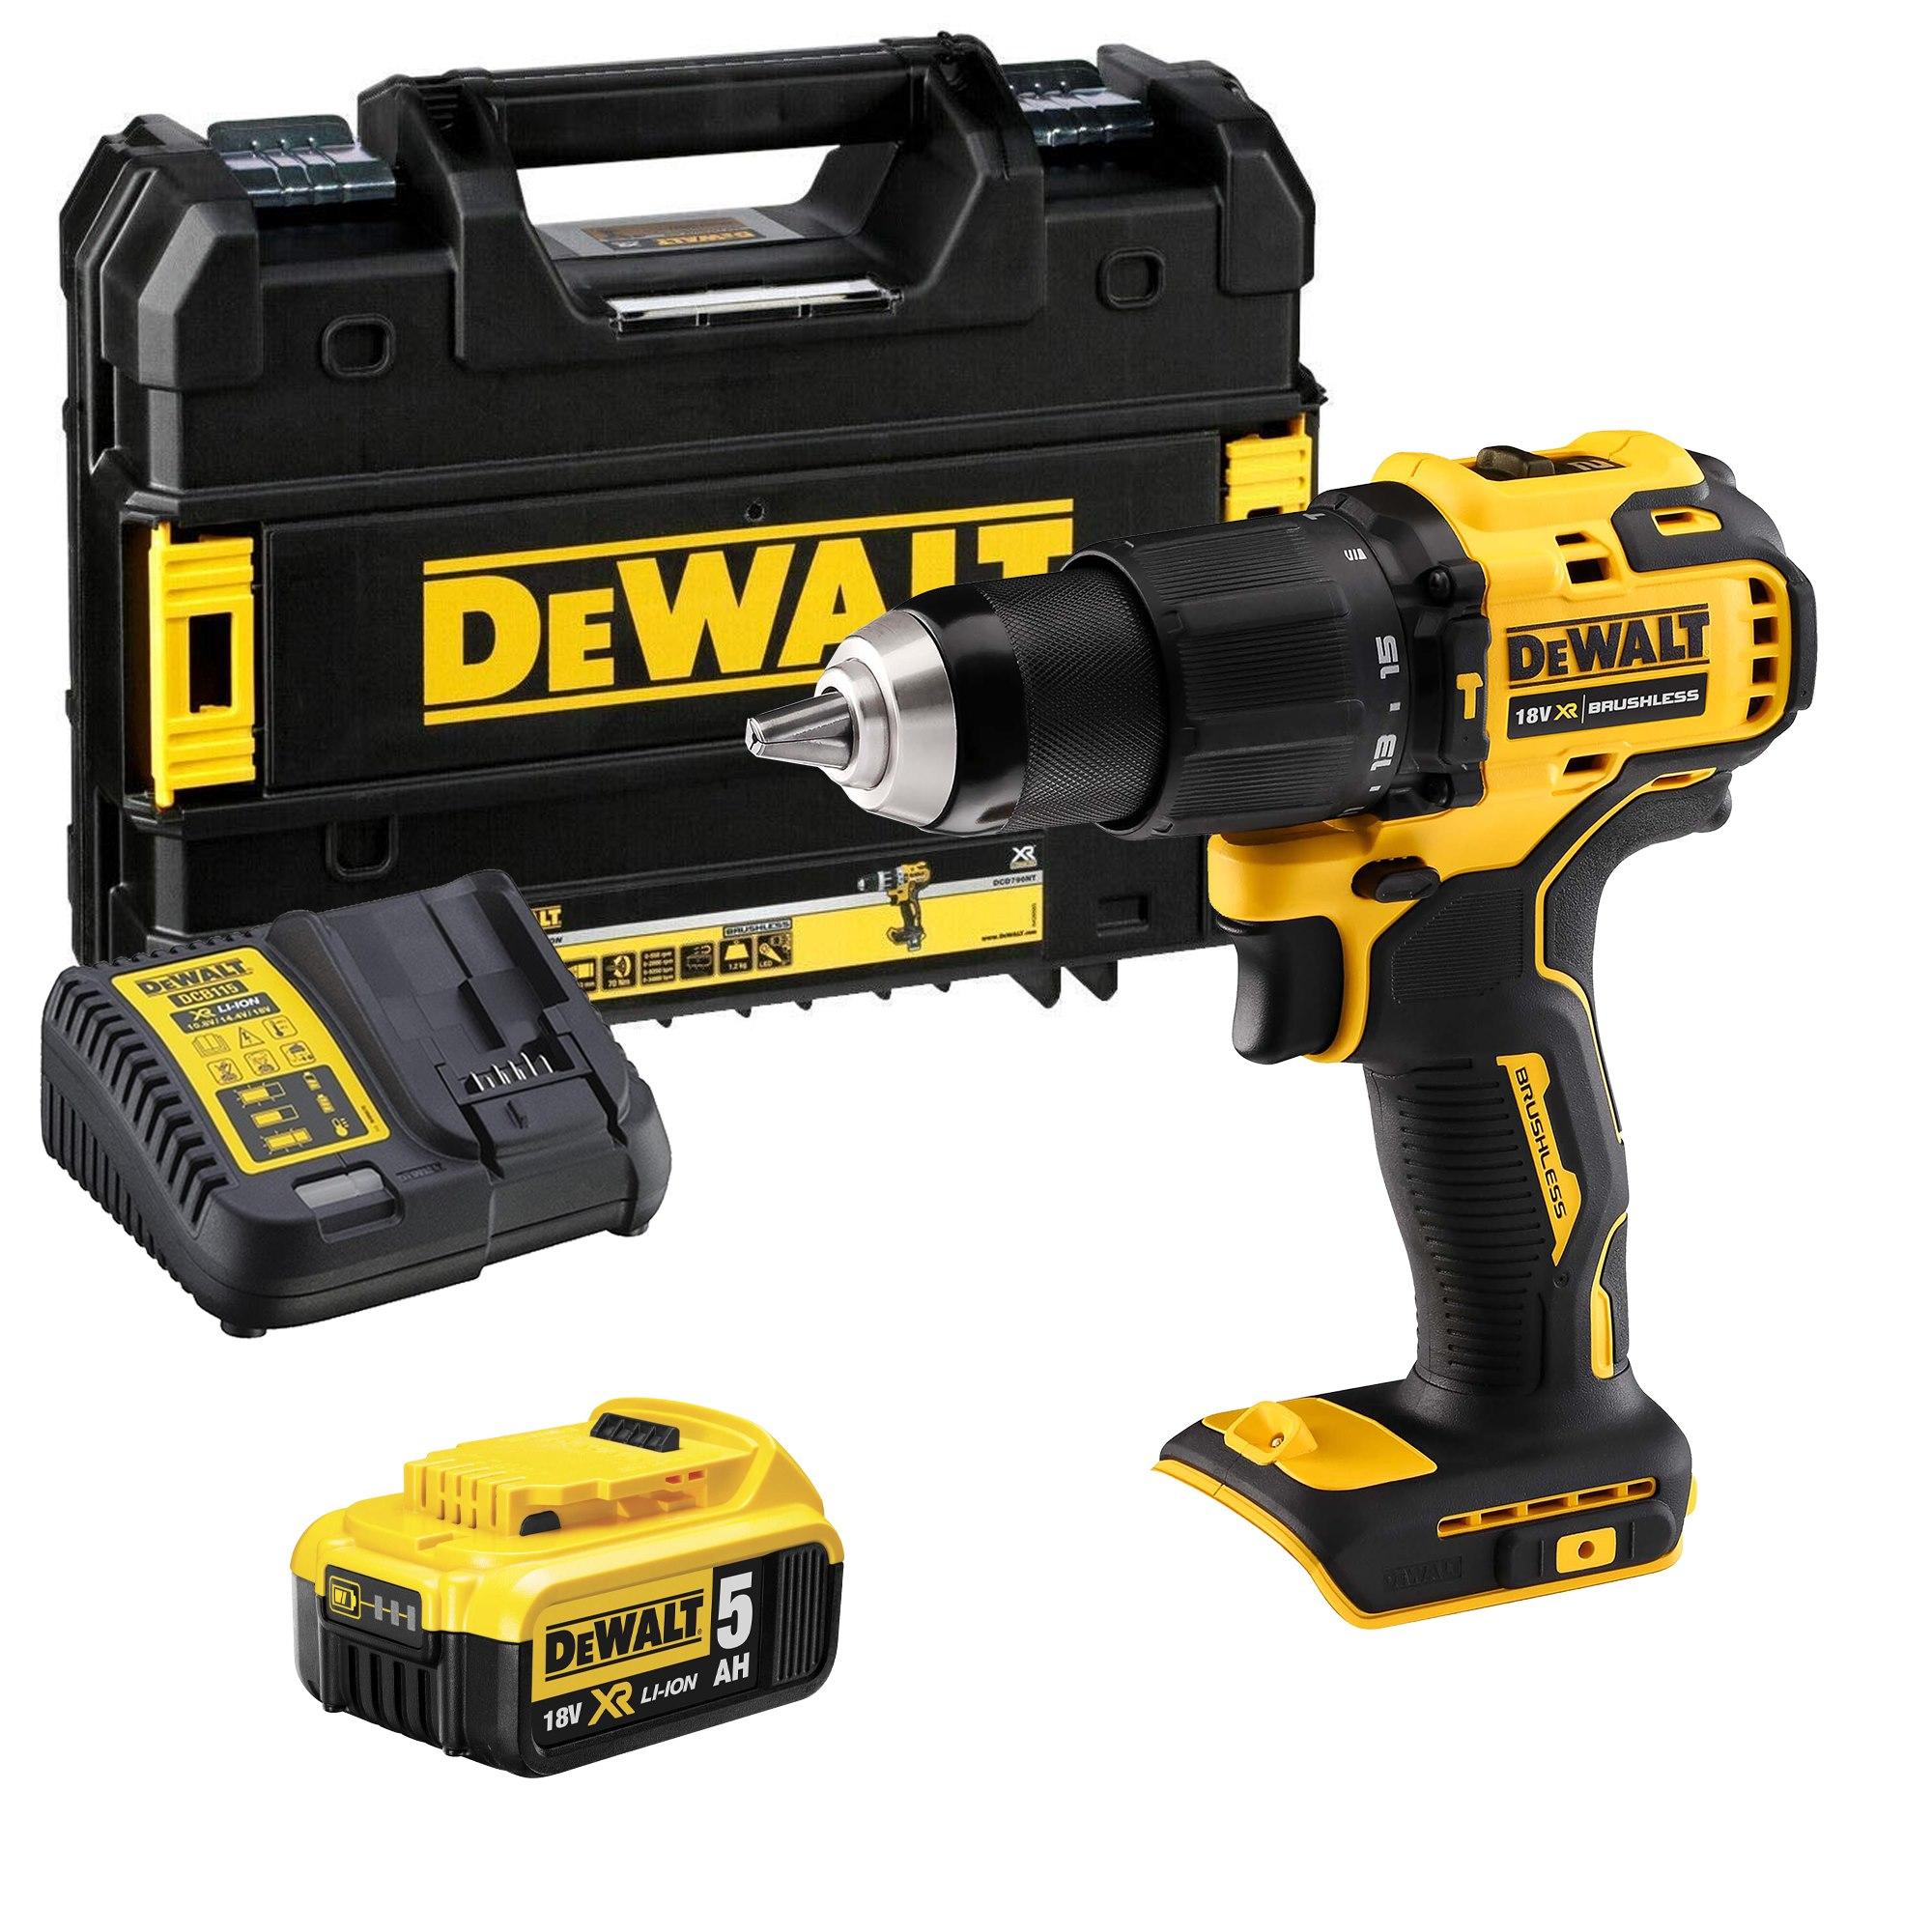 Dewalt DCD709T1T 18V XR Brushless Combi Drill + 1 x 5.0Ah battery - £99.99 @ ITS